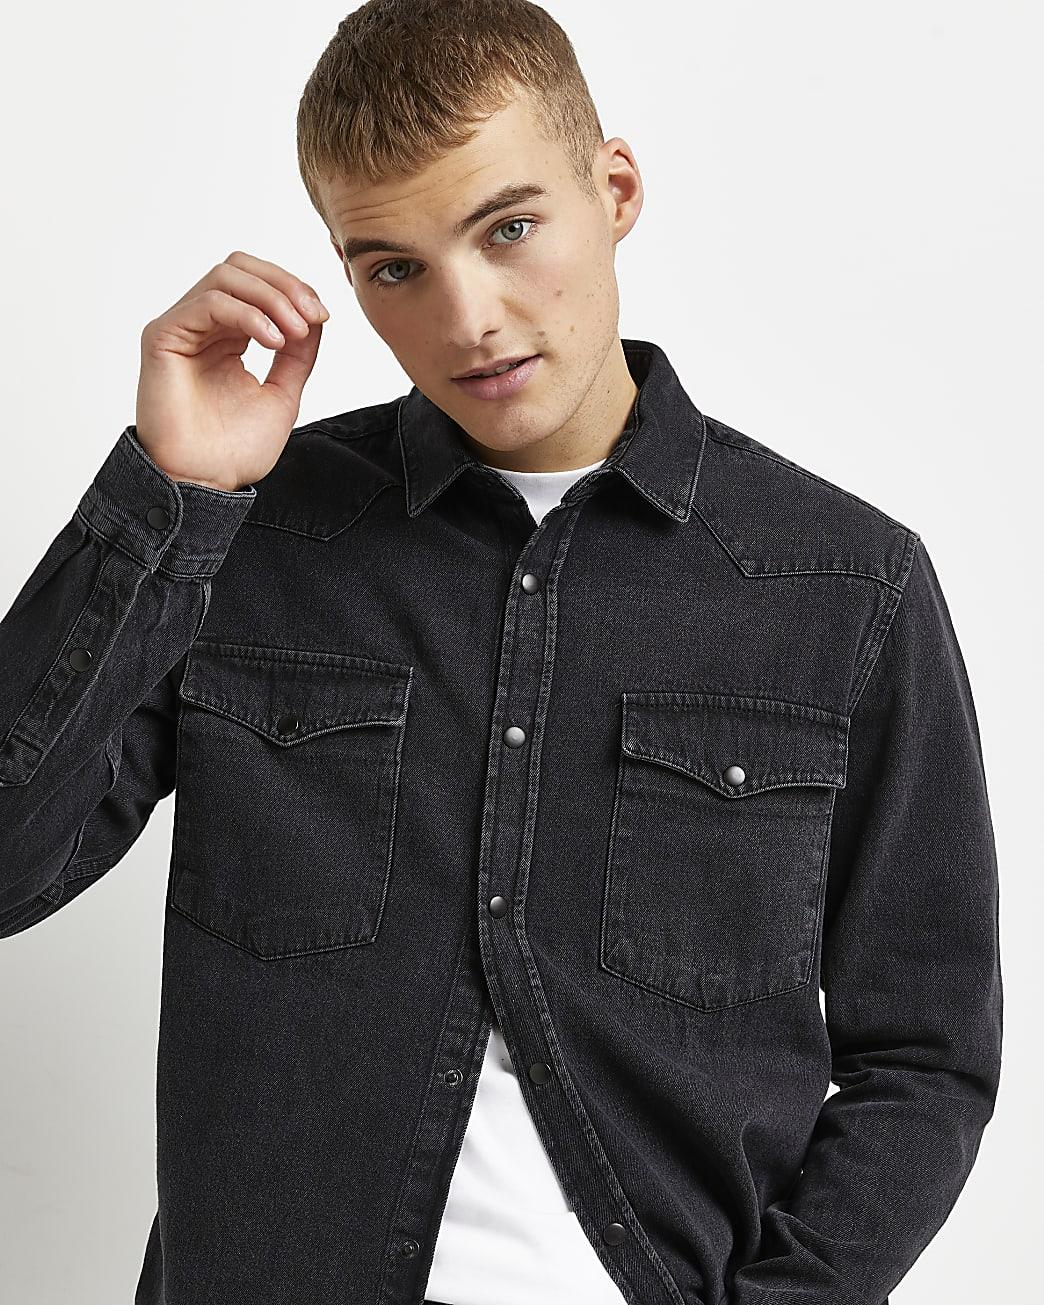 Black regular fit long sleeve denim shirt